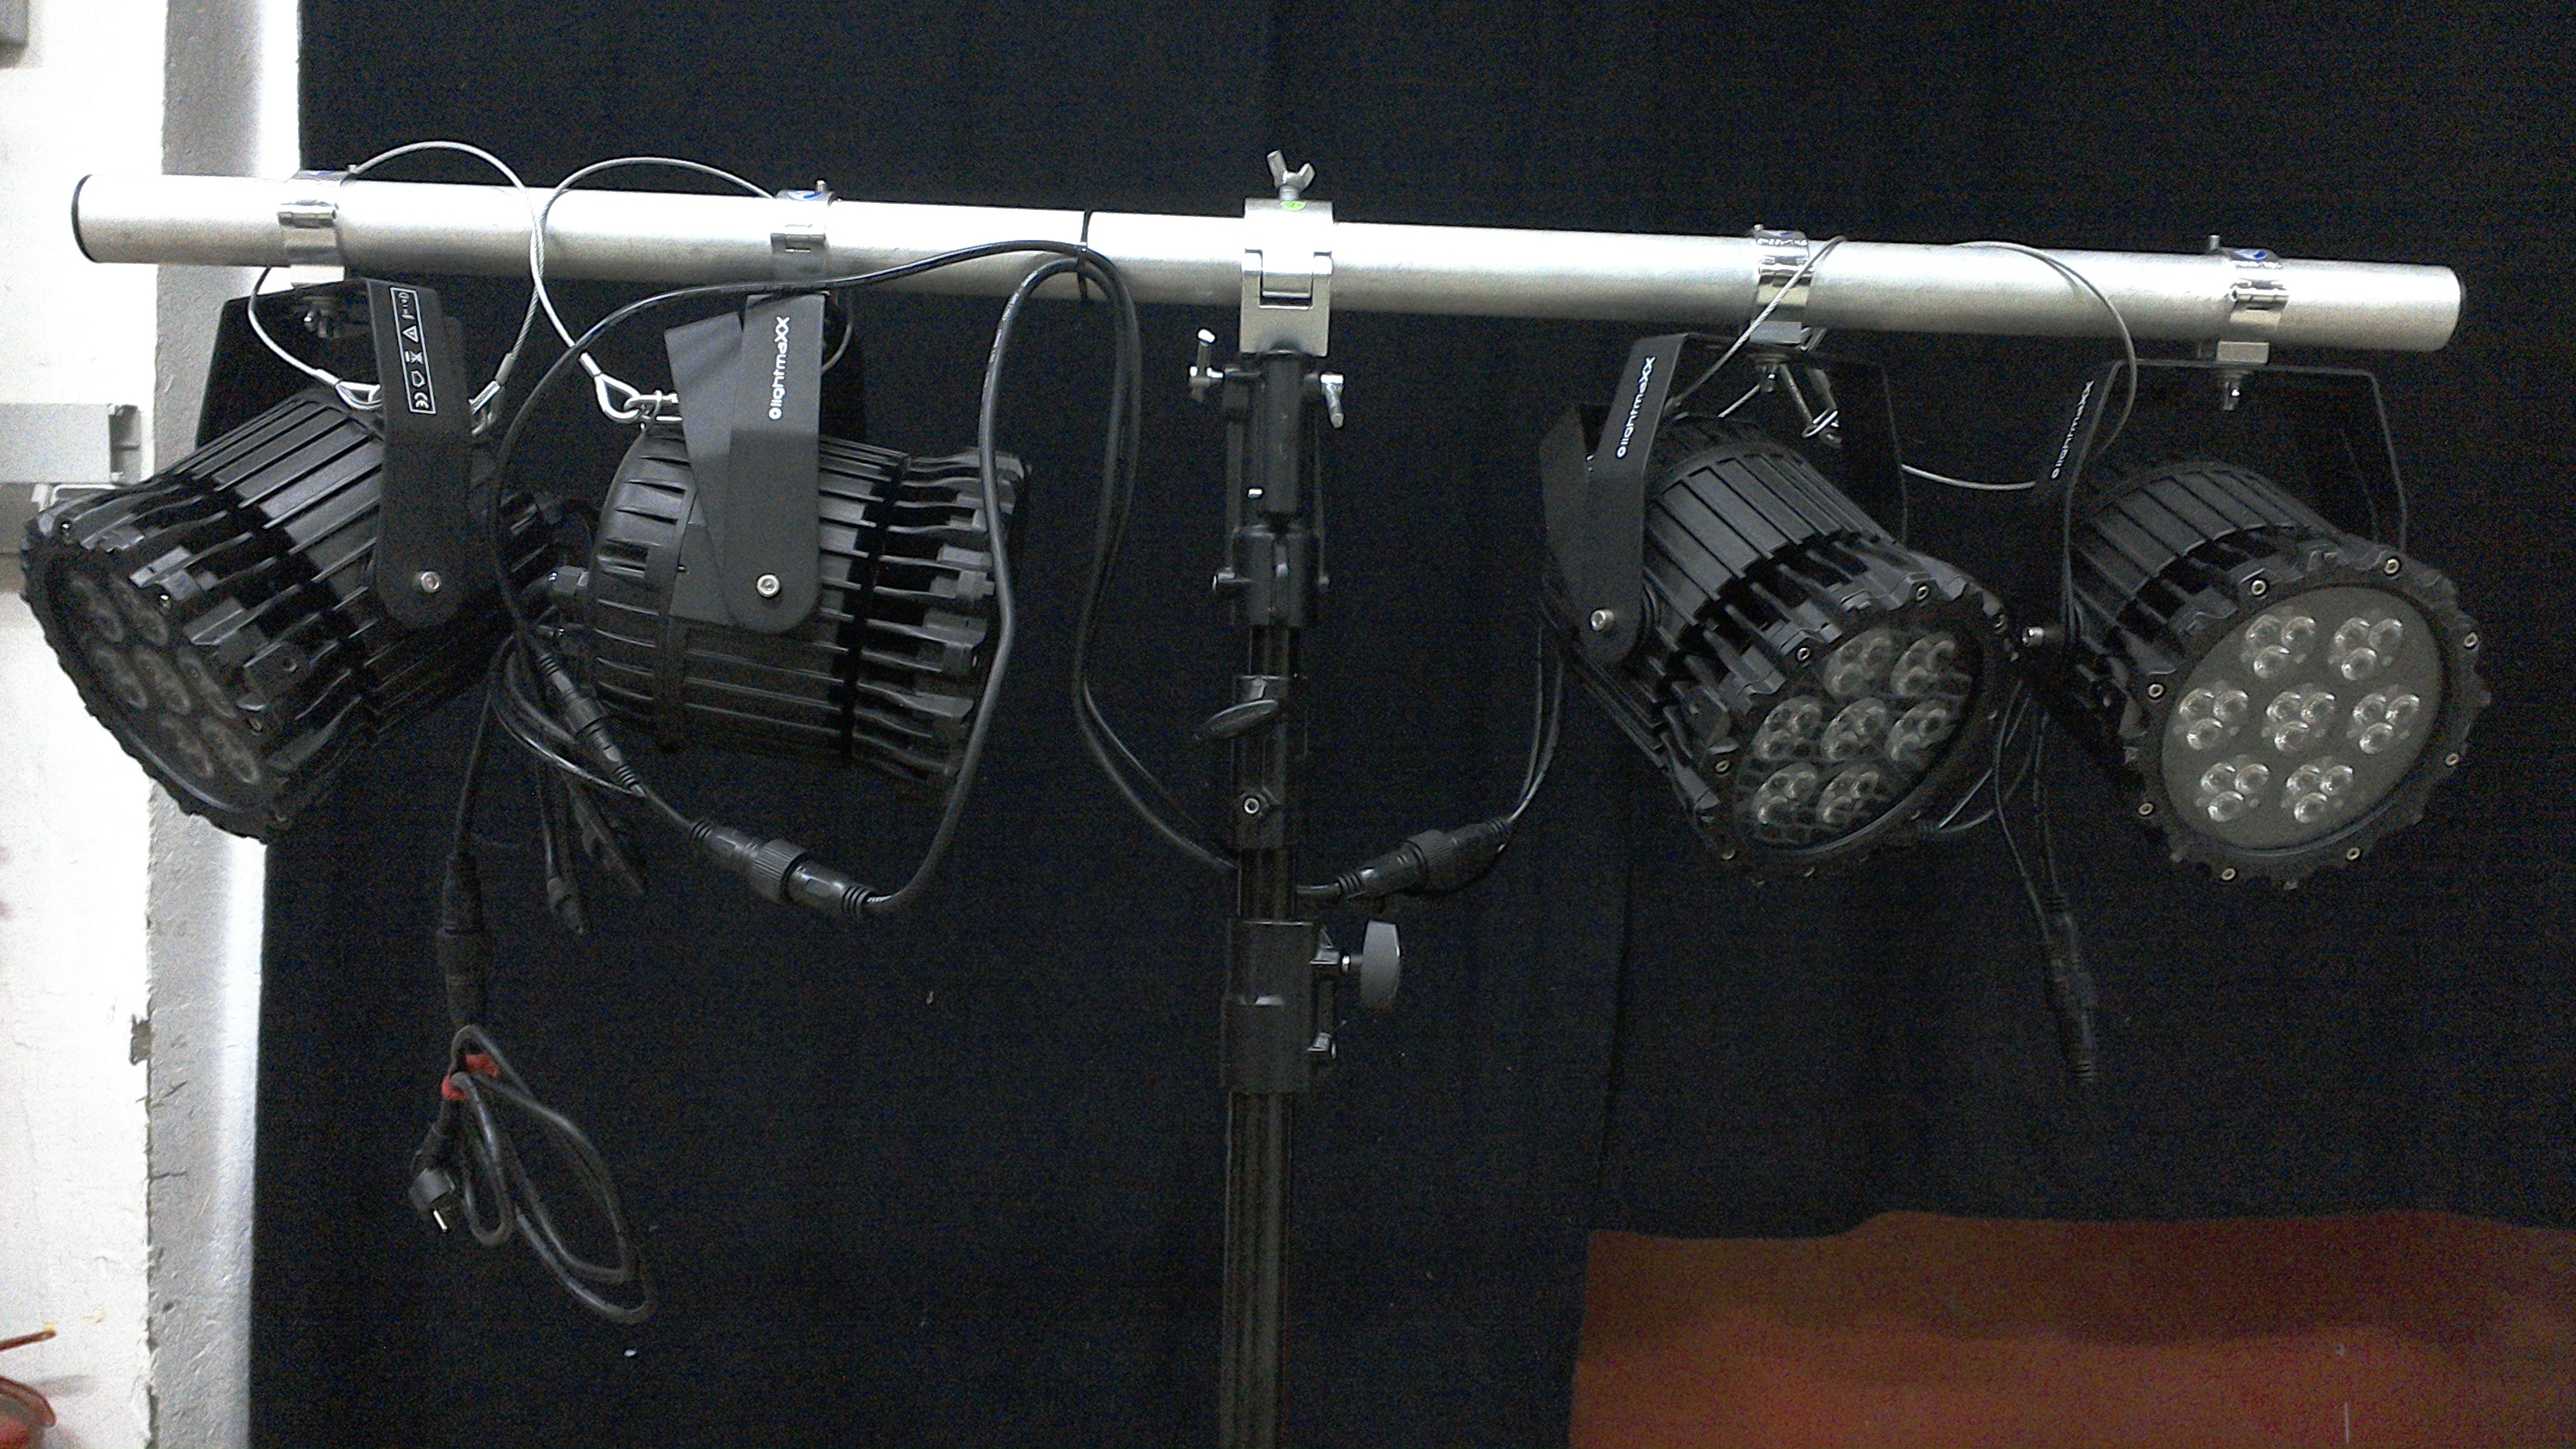 LED PAR 64 Outddor